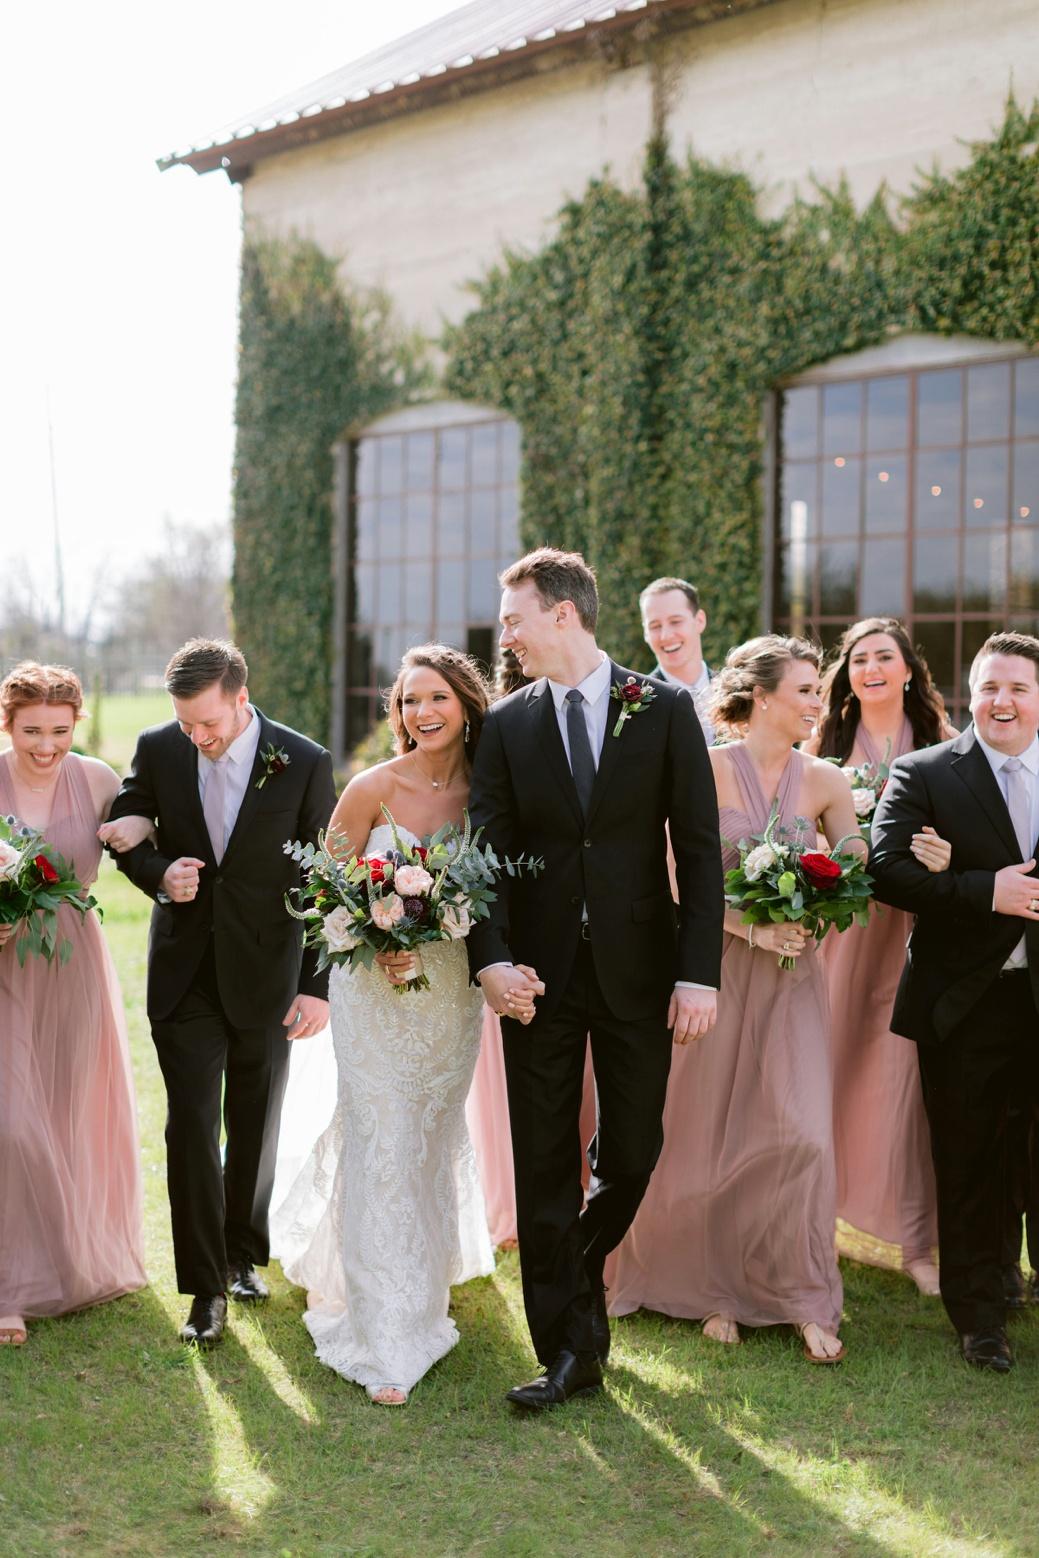 Olde-Dobbin-Station-Wedding-Photographer-19